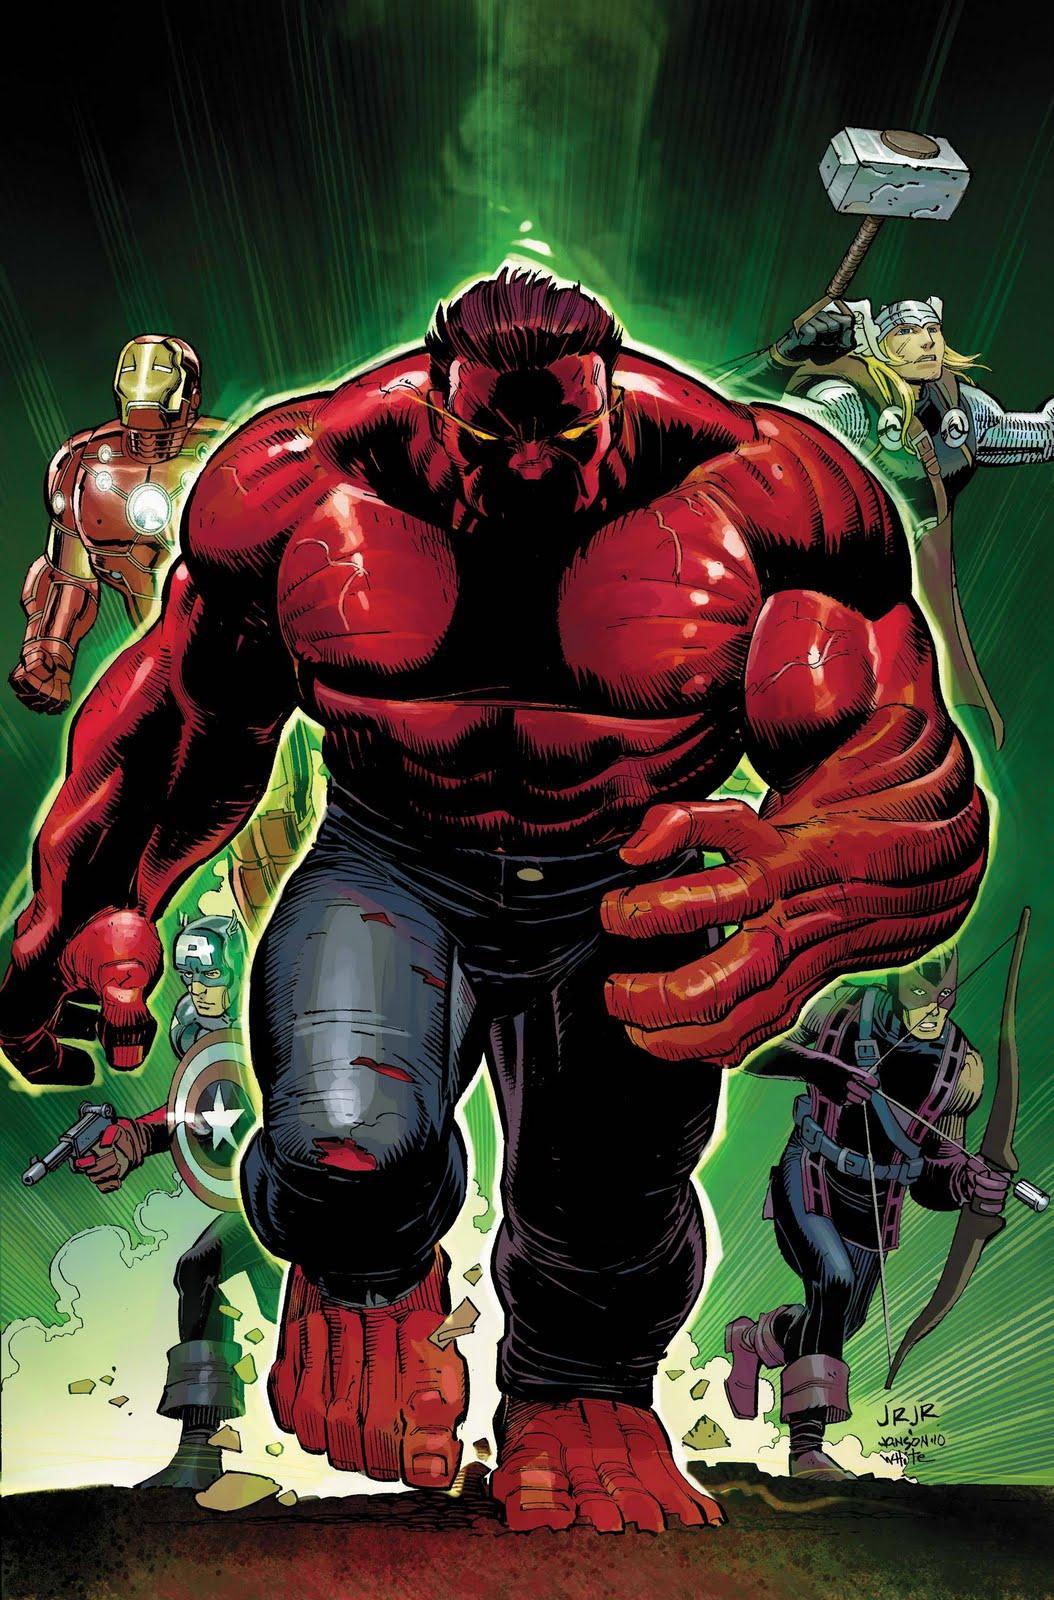 Marveleando con los huevonazos red hulk taddeus e ross - Pictures of red hulk ...